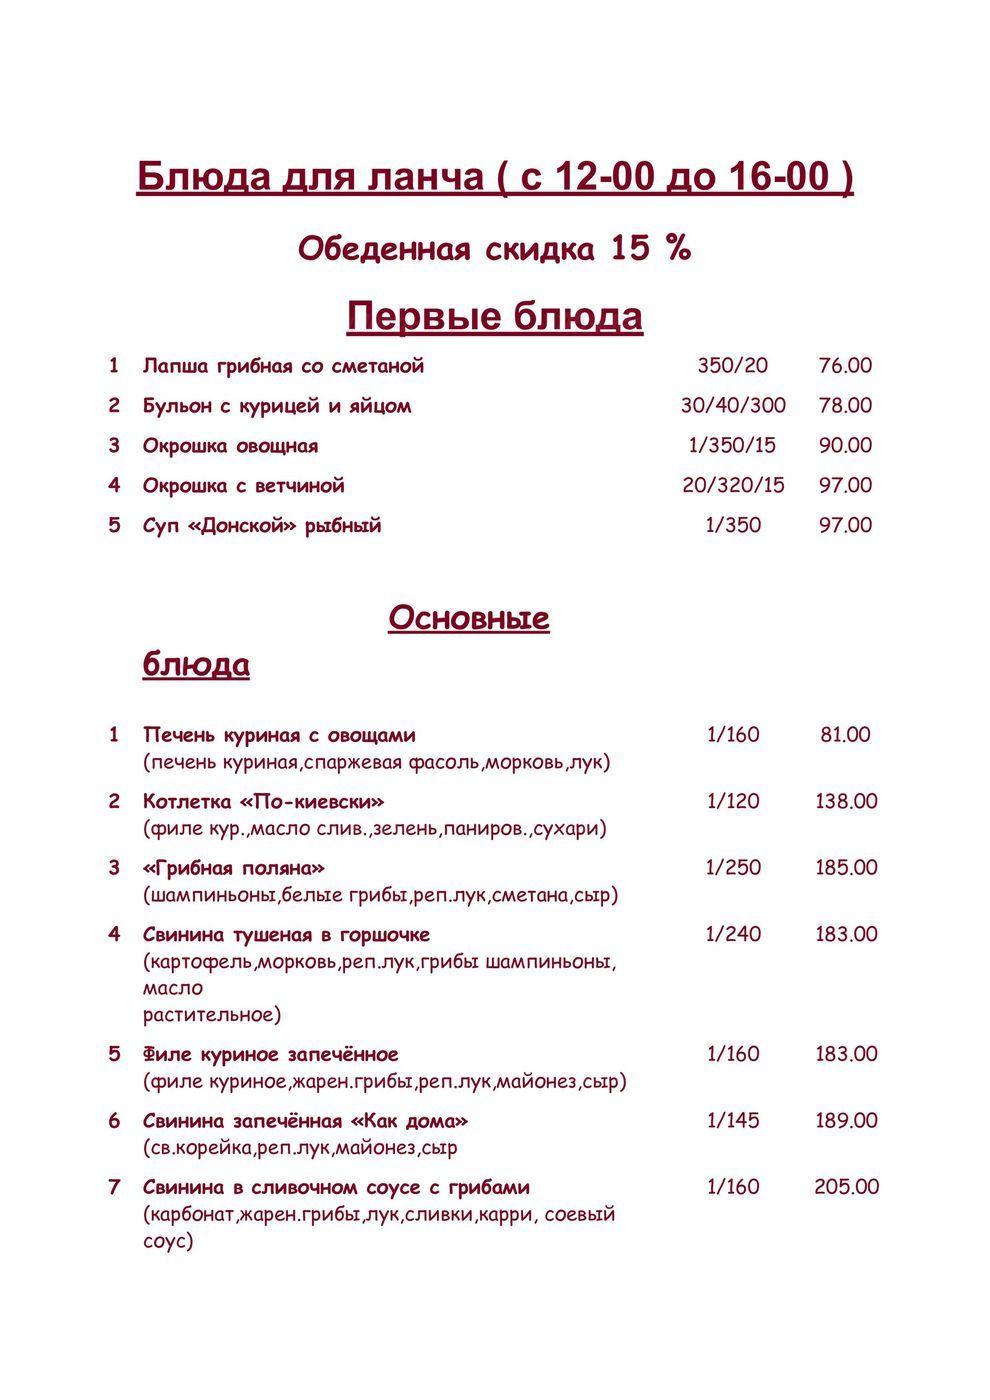 Меню кафе Мельба на улице Кирова фото 14